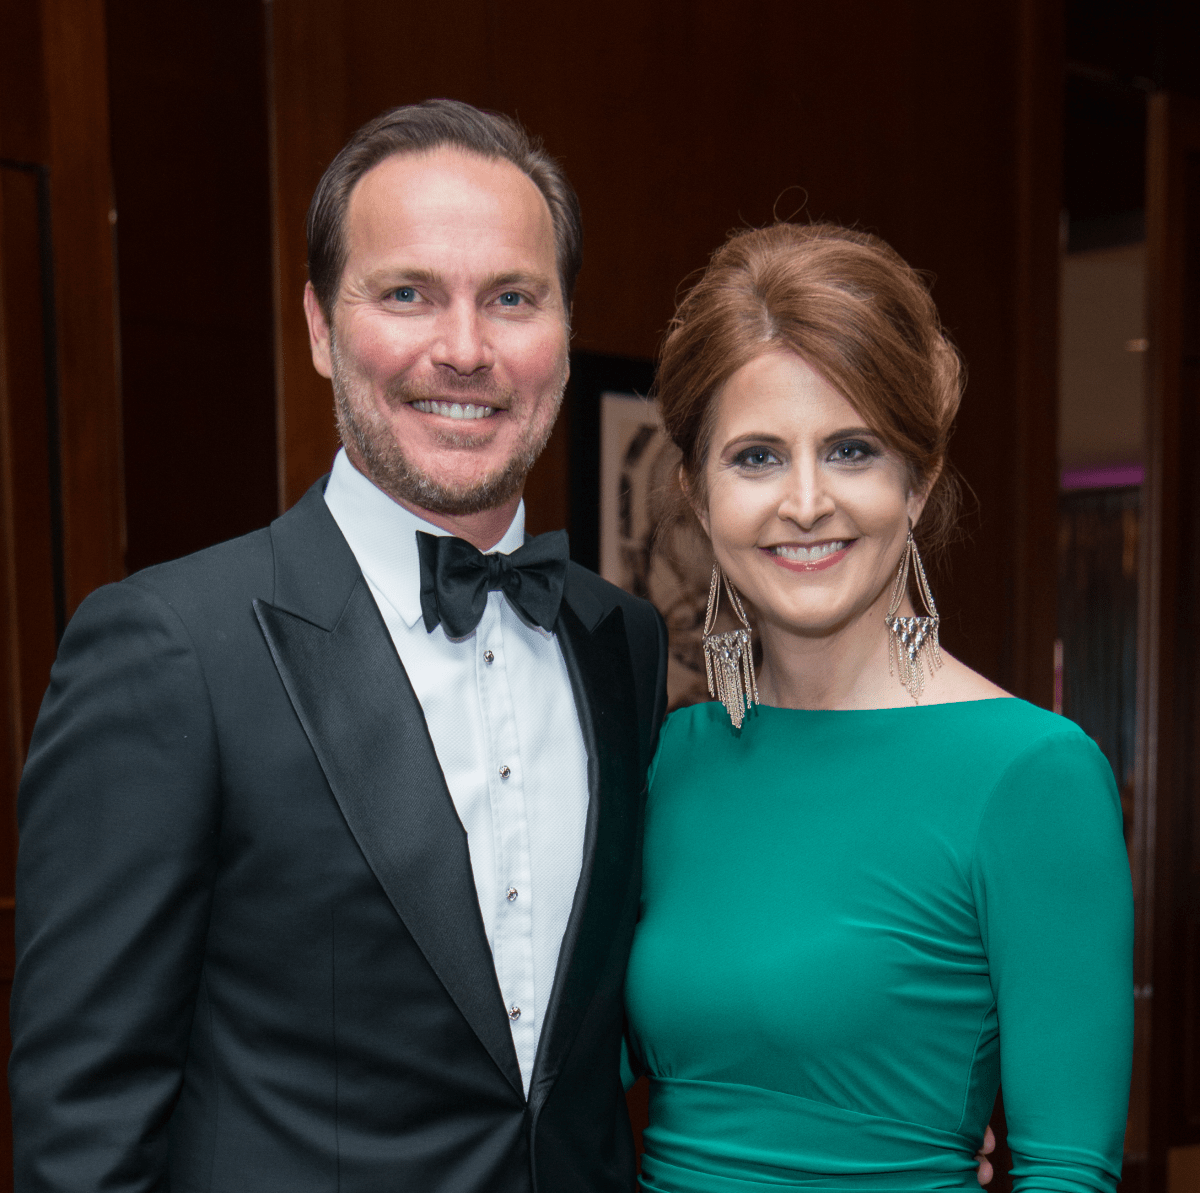 Komen Foundation 25th Gala, Feb. 2016, Jonathan Brinsden, Carrie Brinsden